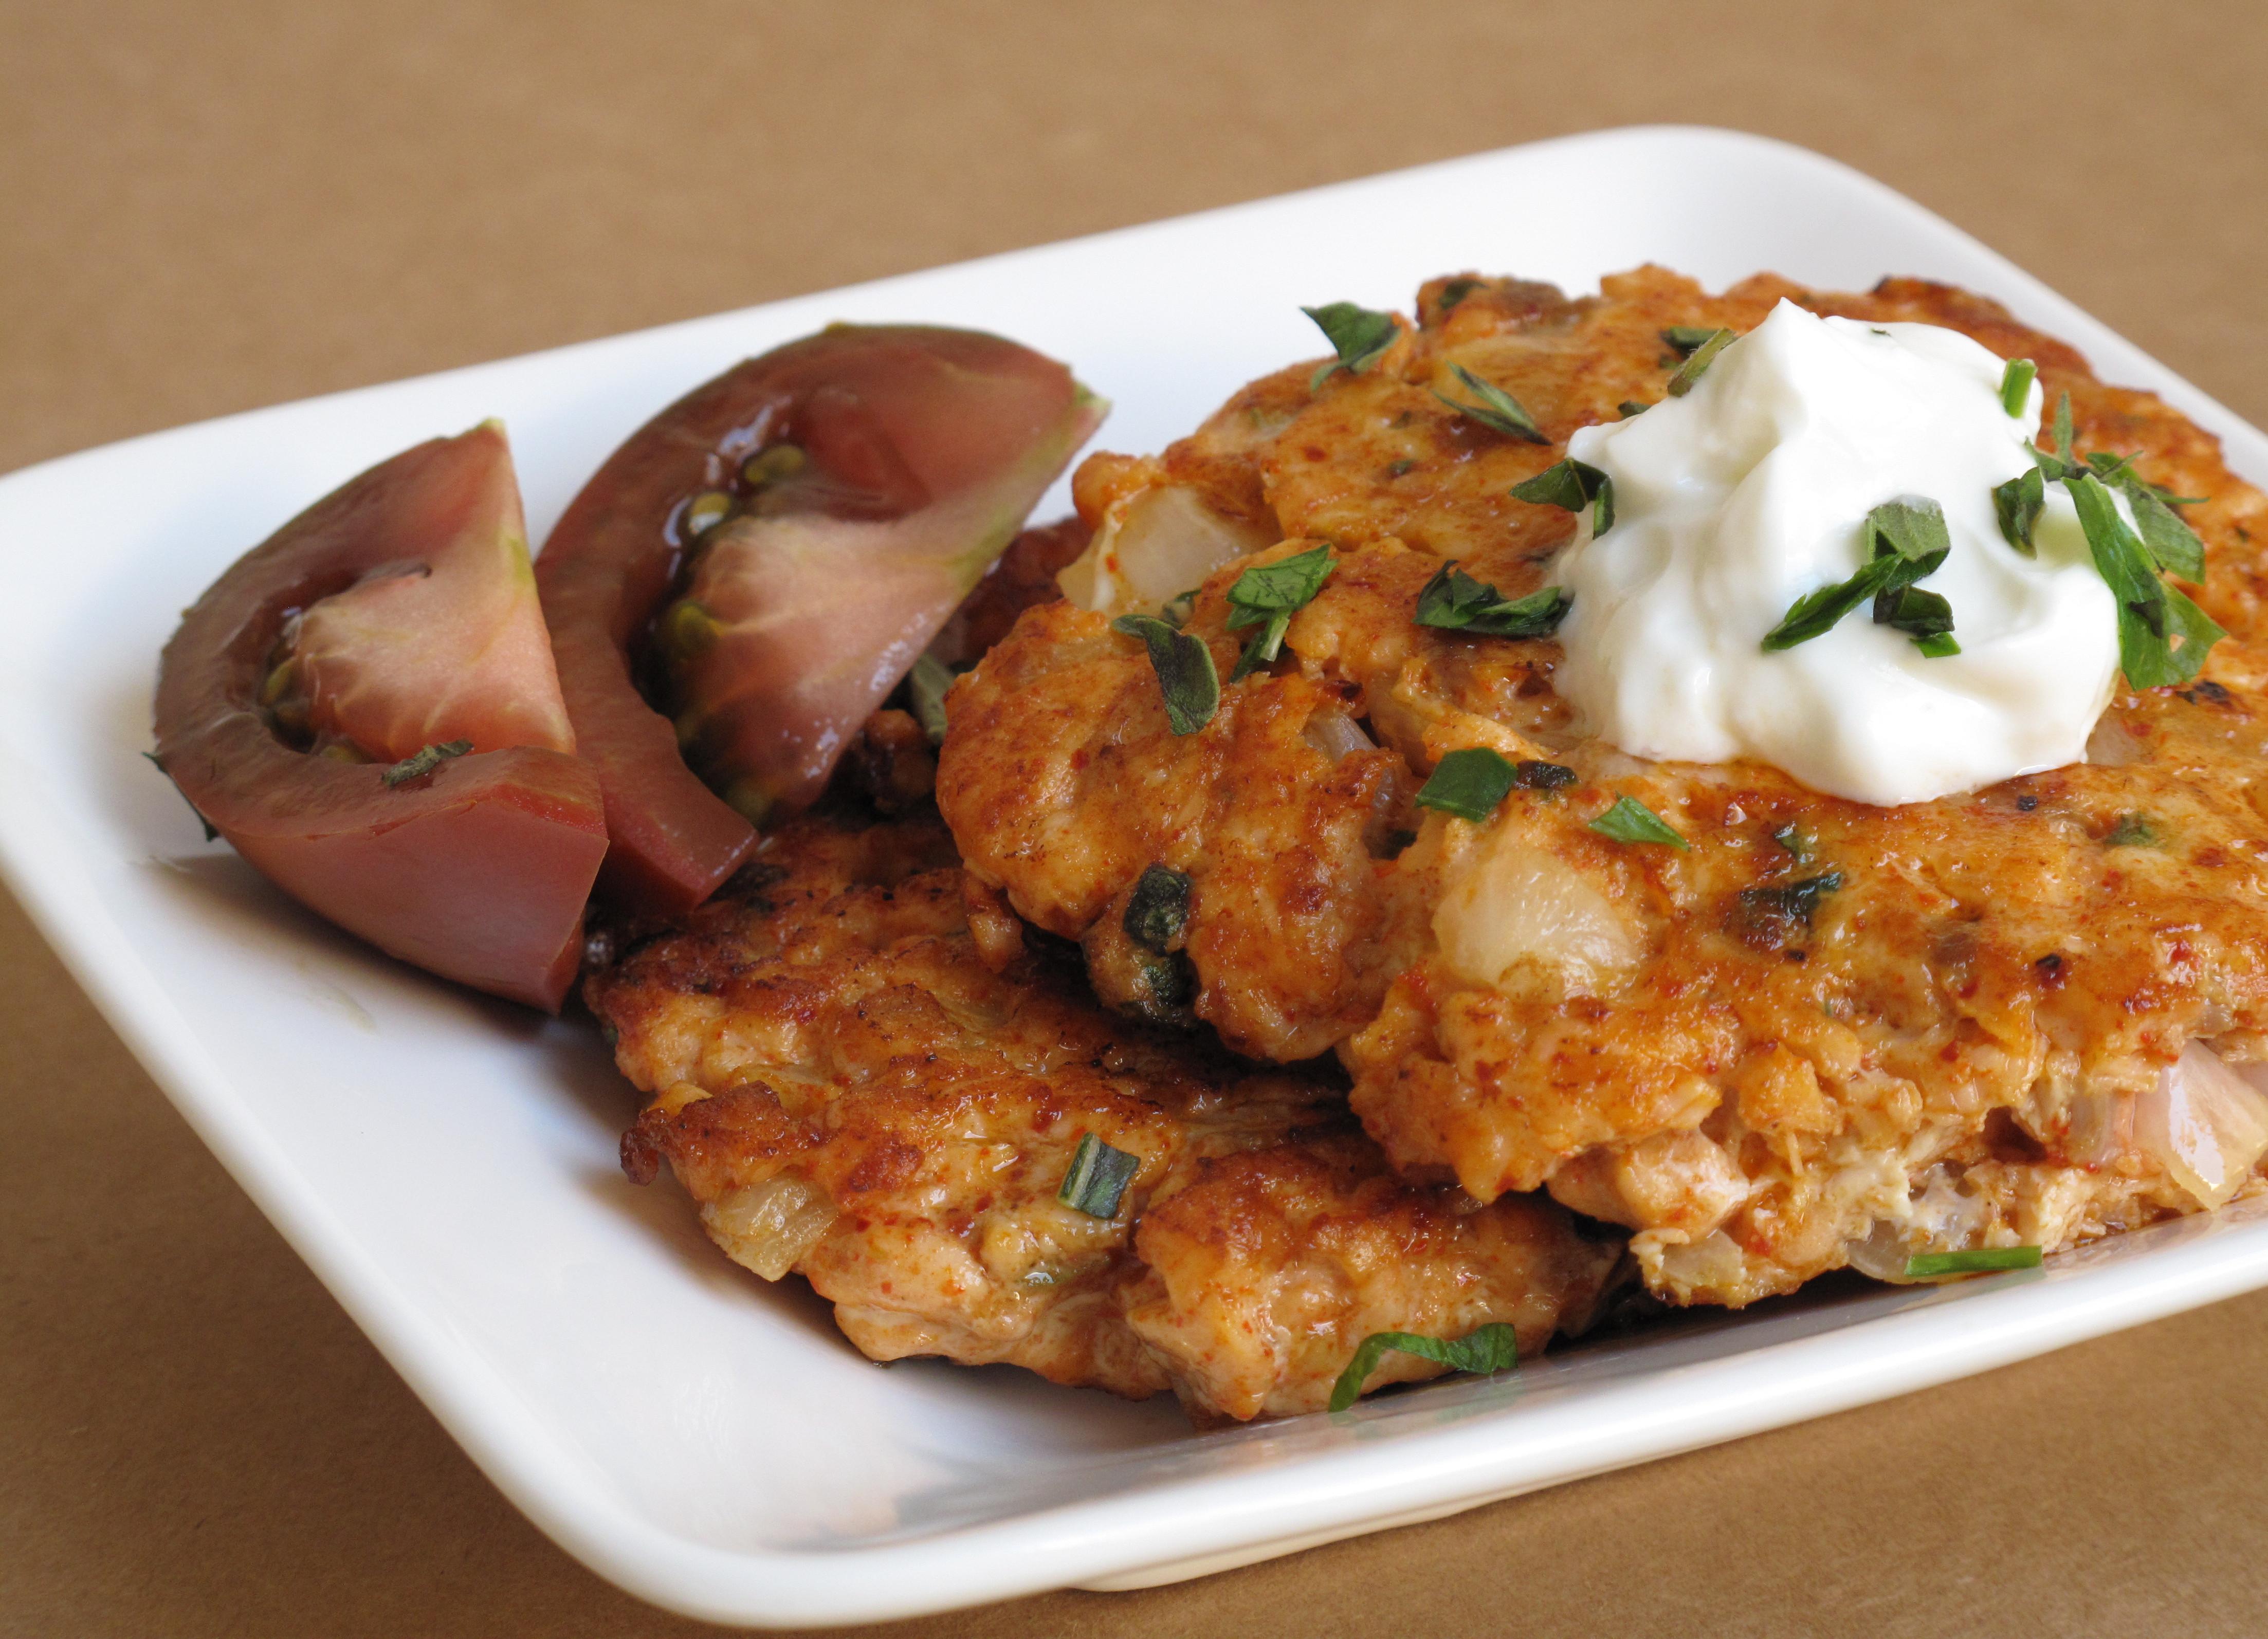 Healthy Breakfast Sausage  Healthy Spa Recipe For Breakfast Salmon Sausage Patties